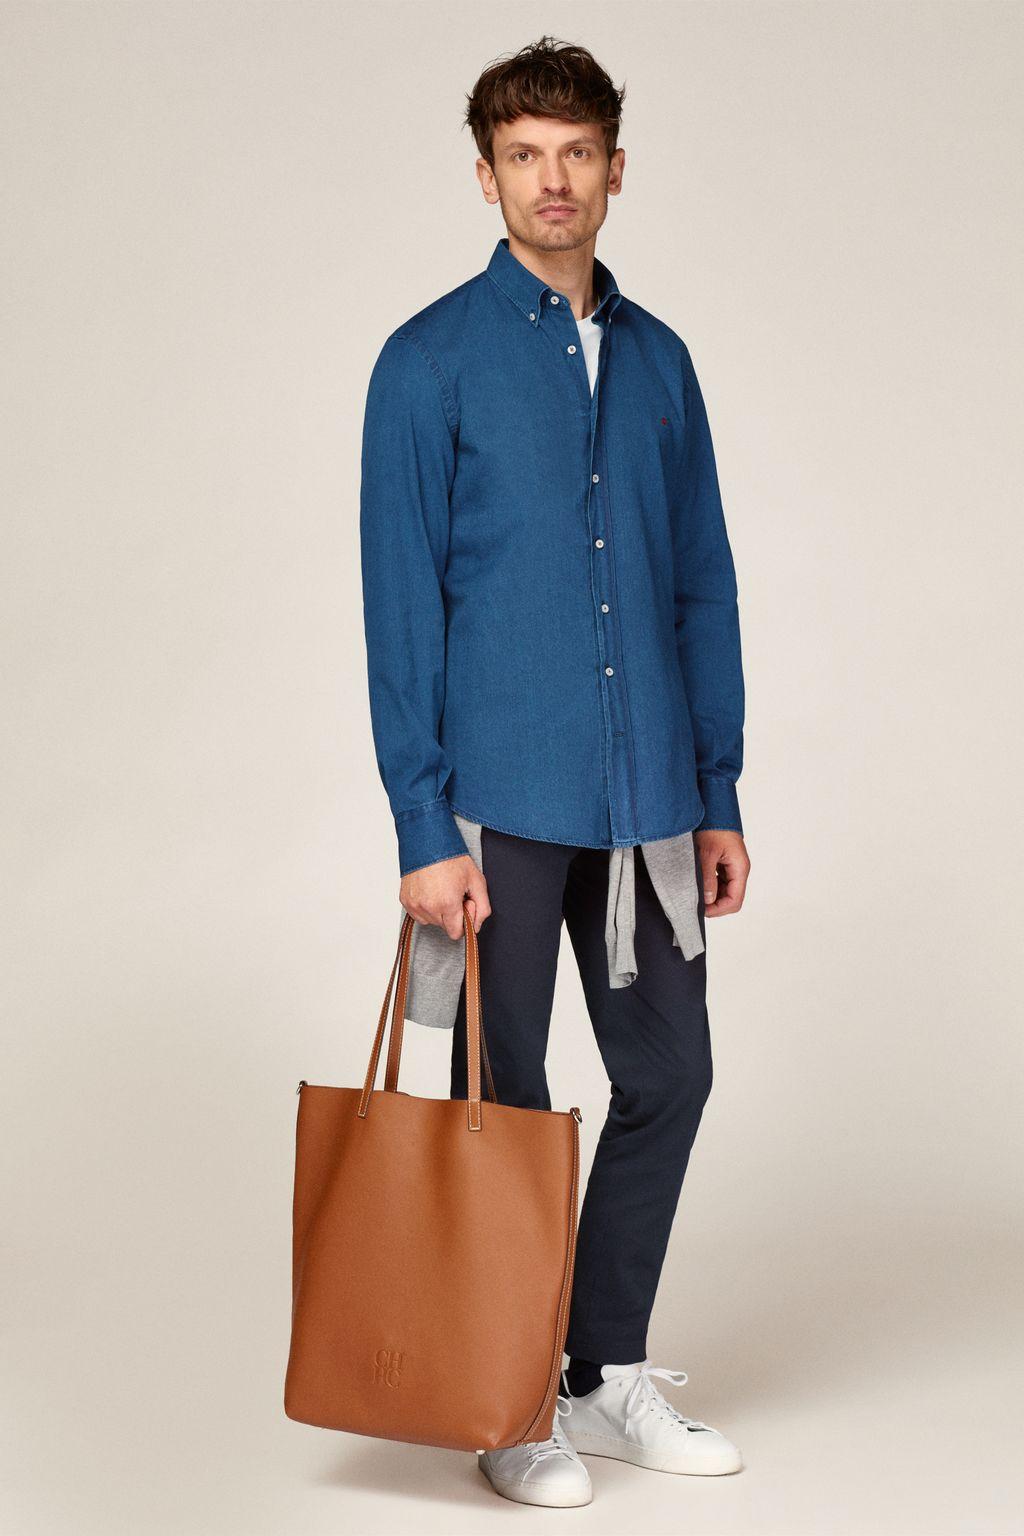 Denim shirt with selvedge